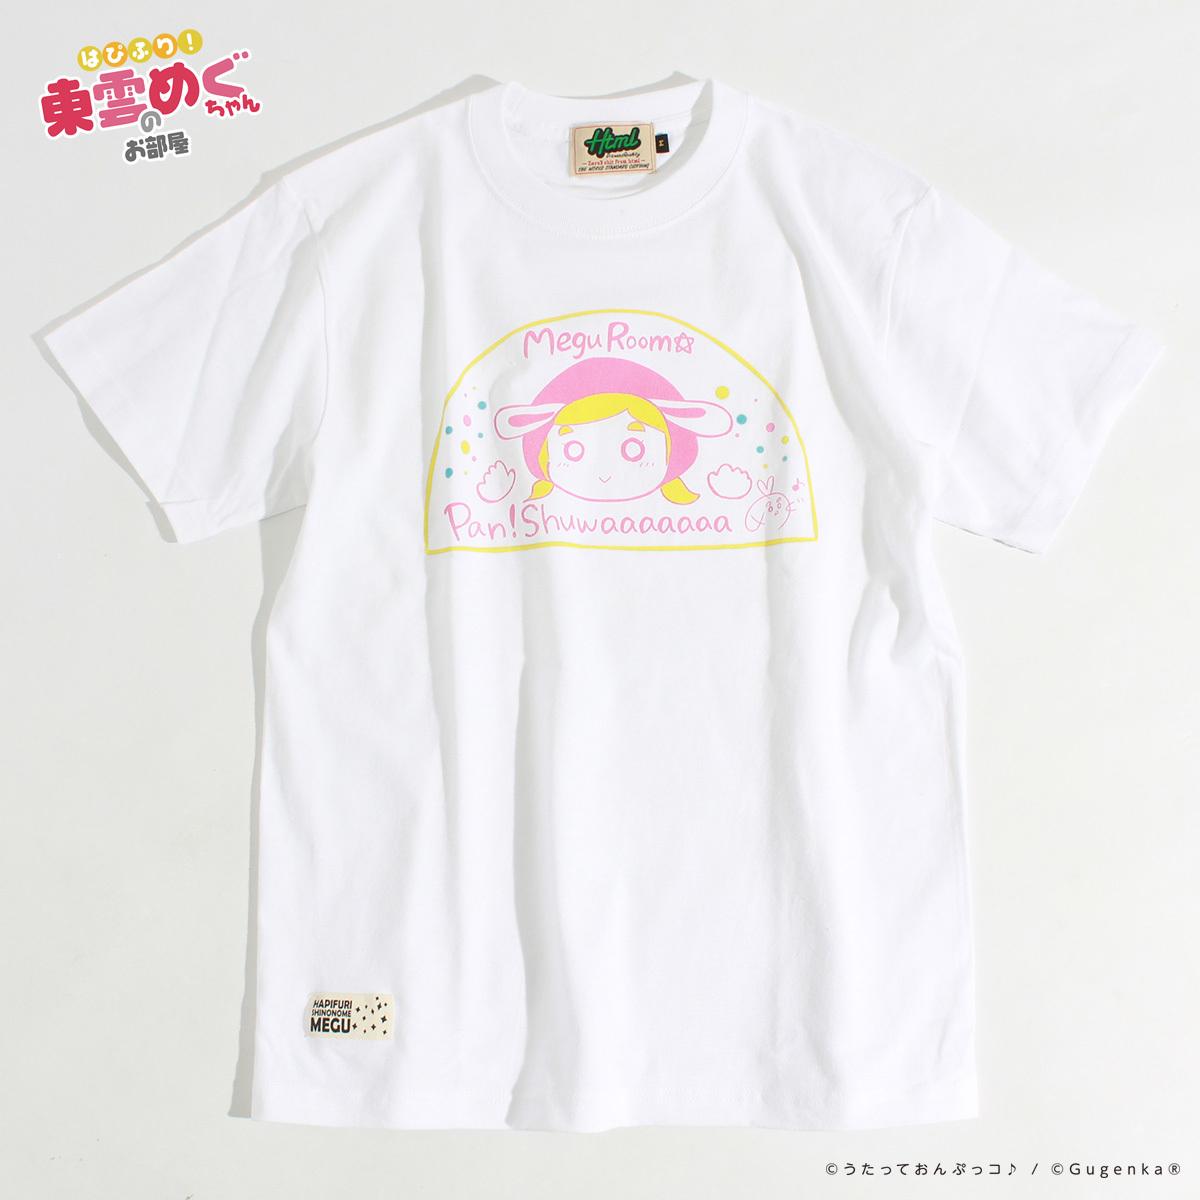 東雲めぐ Pan!Shuwaaaaaaa Tシャツ